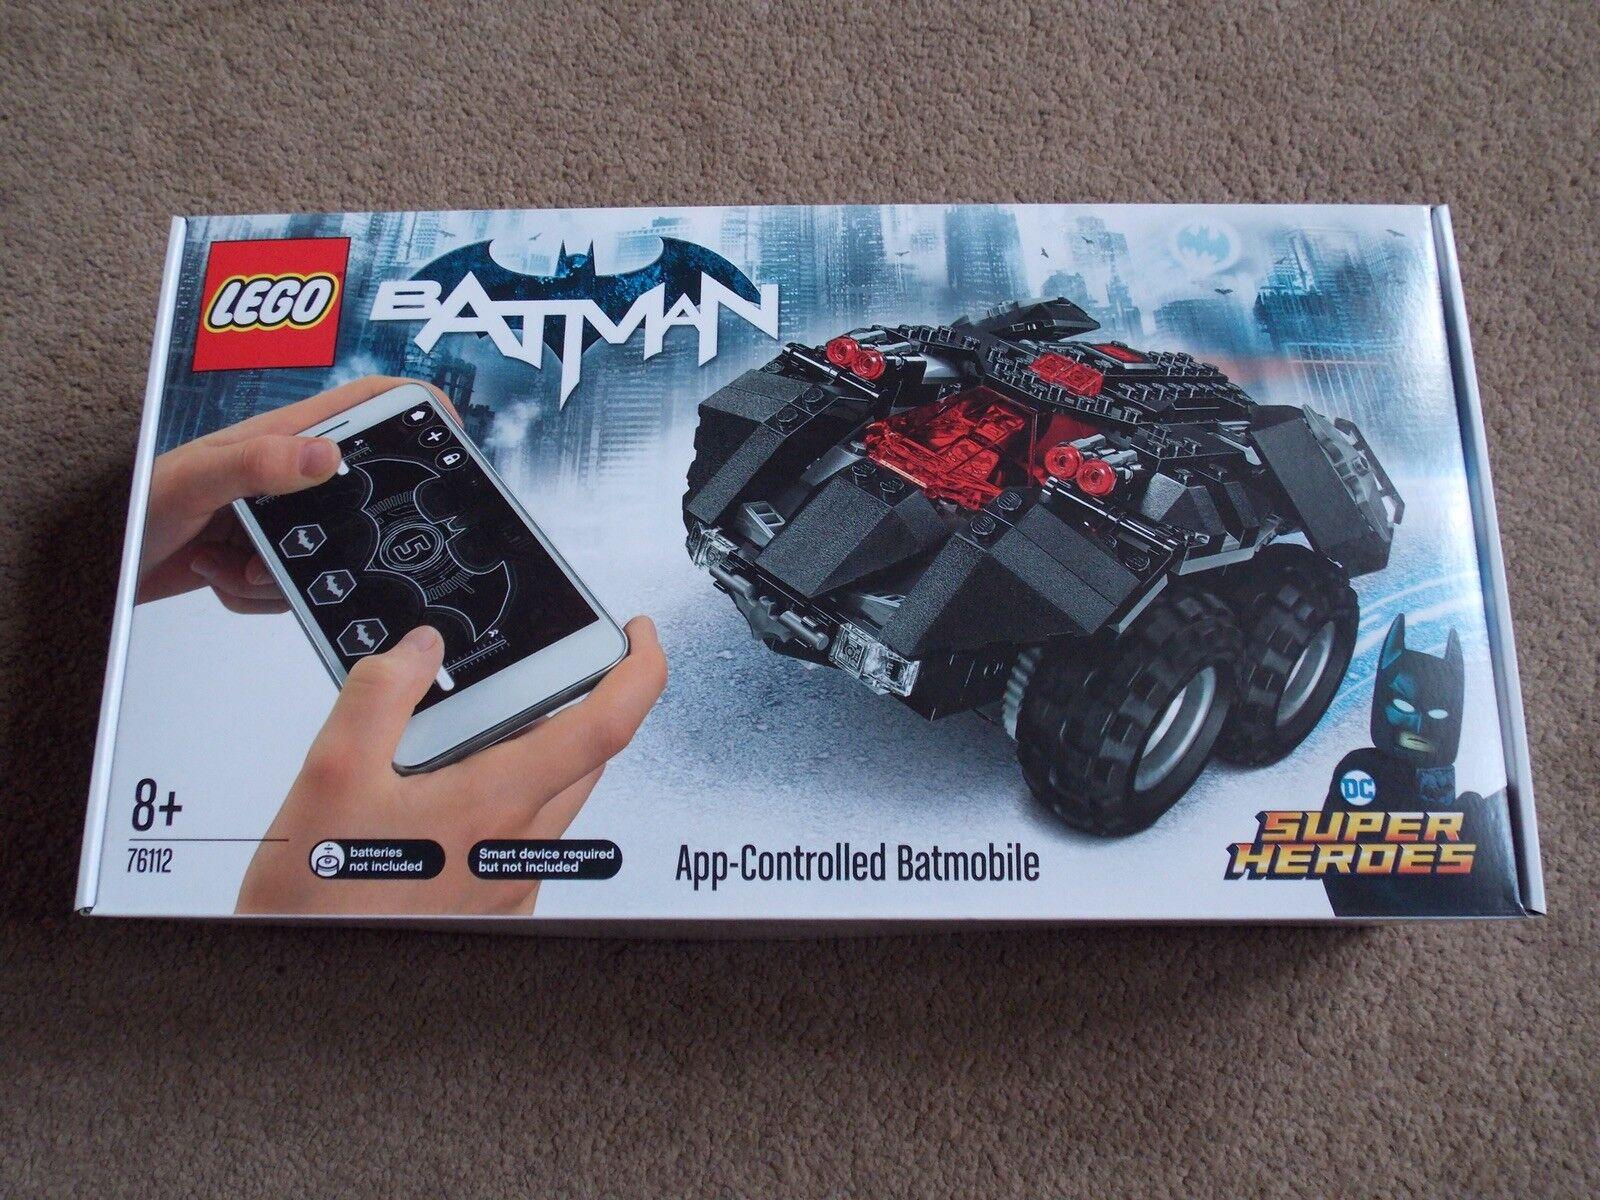 LEGO - SUPER HEROES ( SET 76112 - BATMAN APP-CONTROLLED BATMOBILE ) BRAND NEW